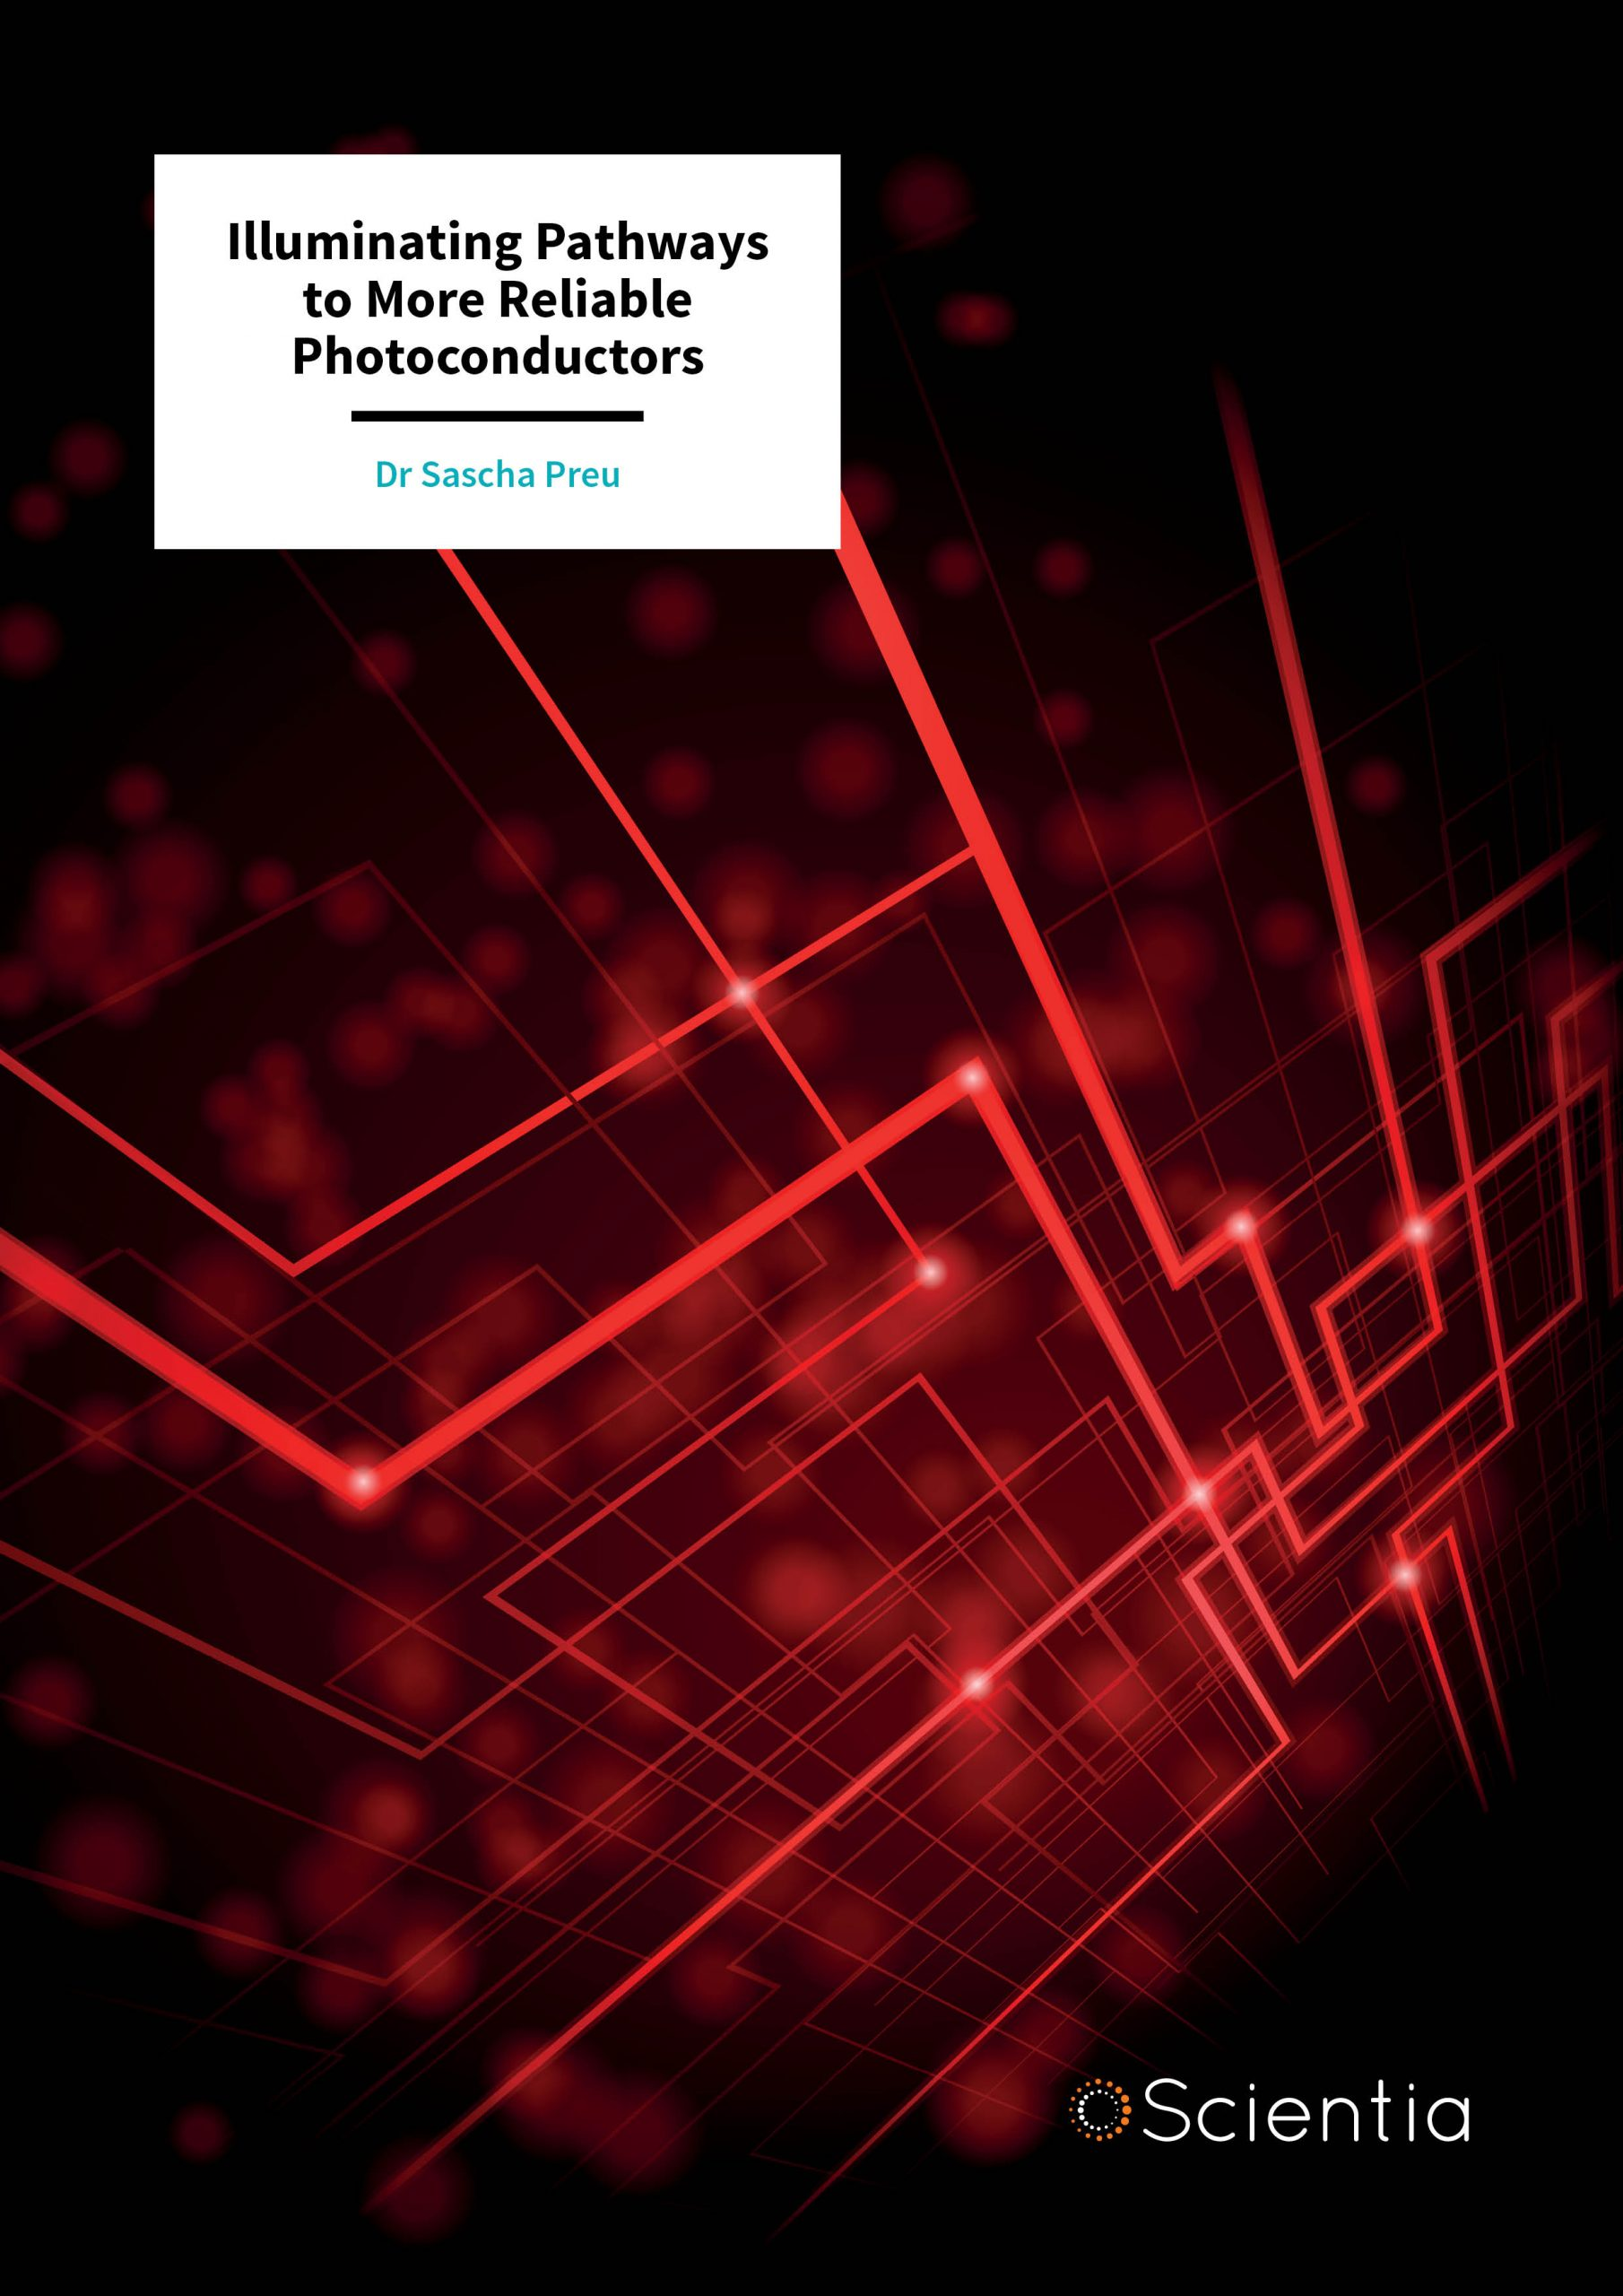 Dr Sascha Preu – Illuminating Pathways to More Reliable Photoconductors